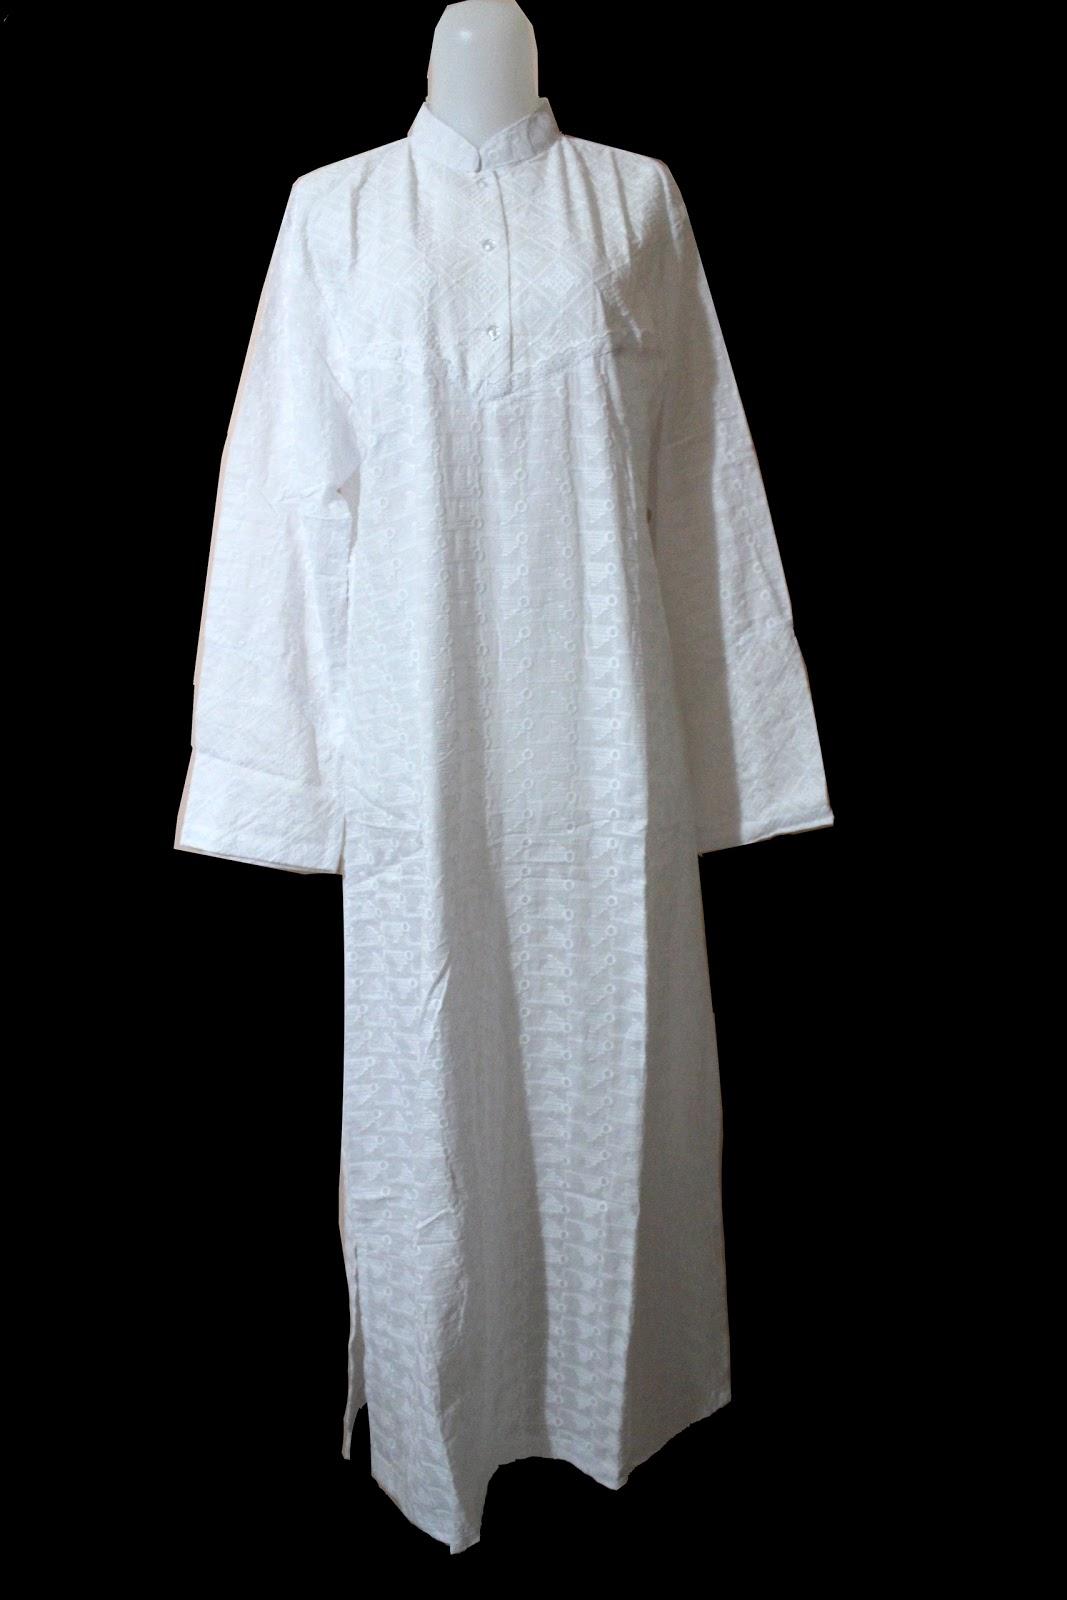 Original On Muslim Women Dress Code Online ShoppingBuy Low Price Muslim Women